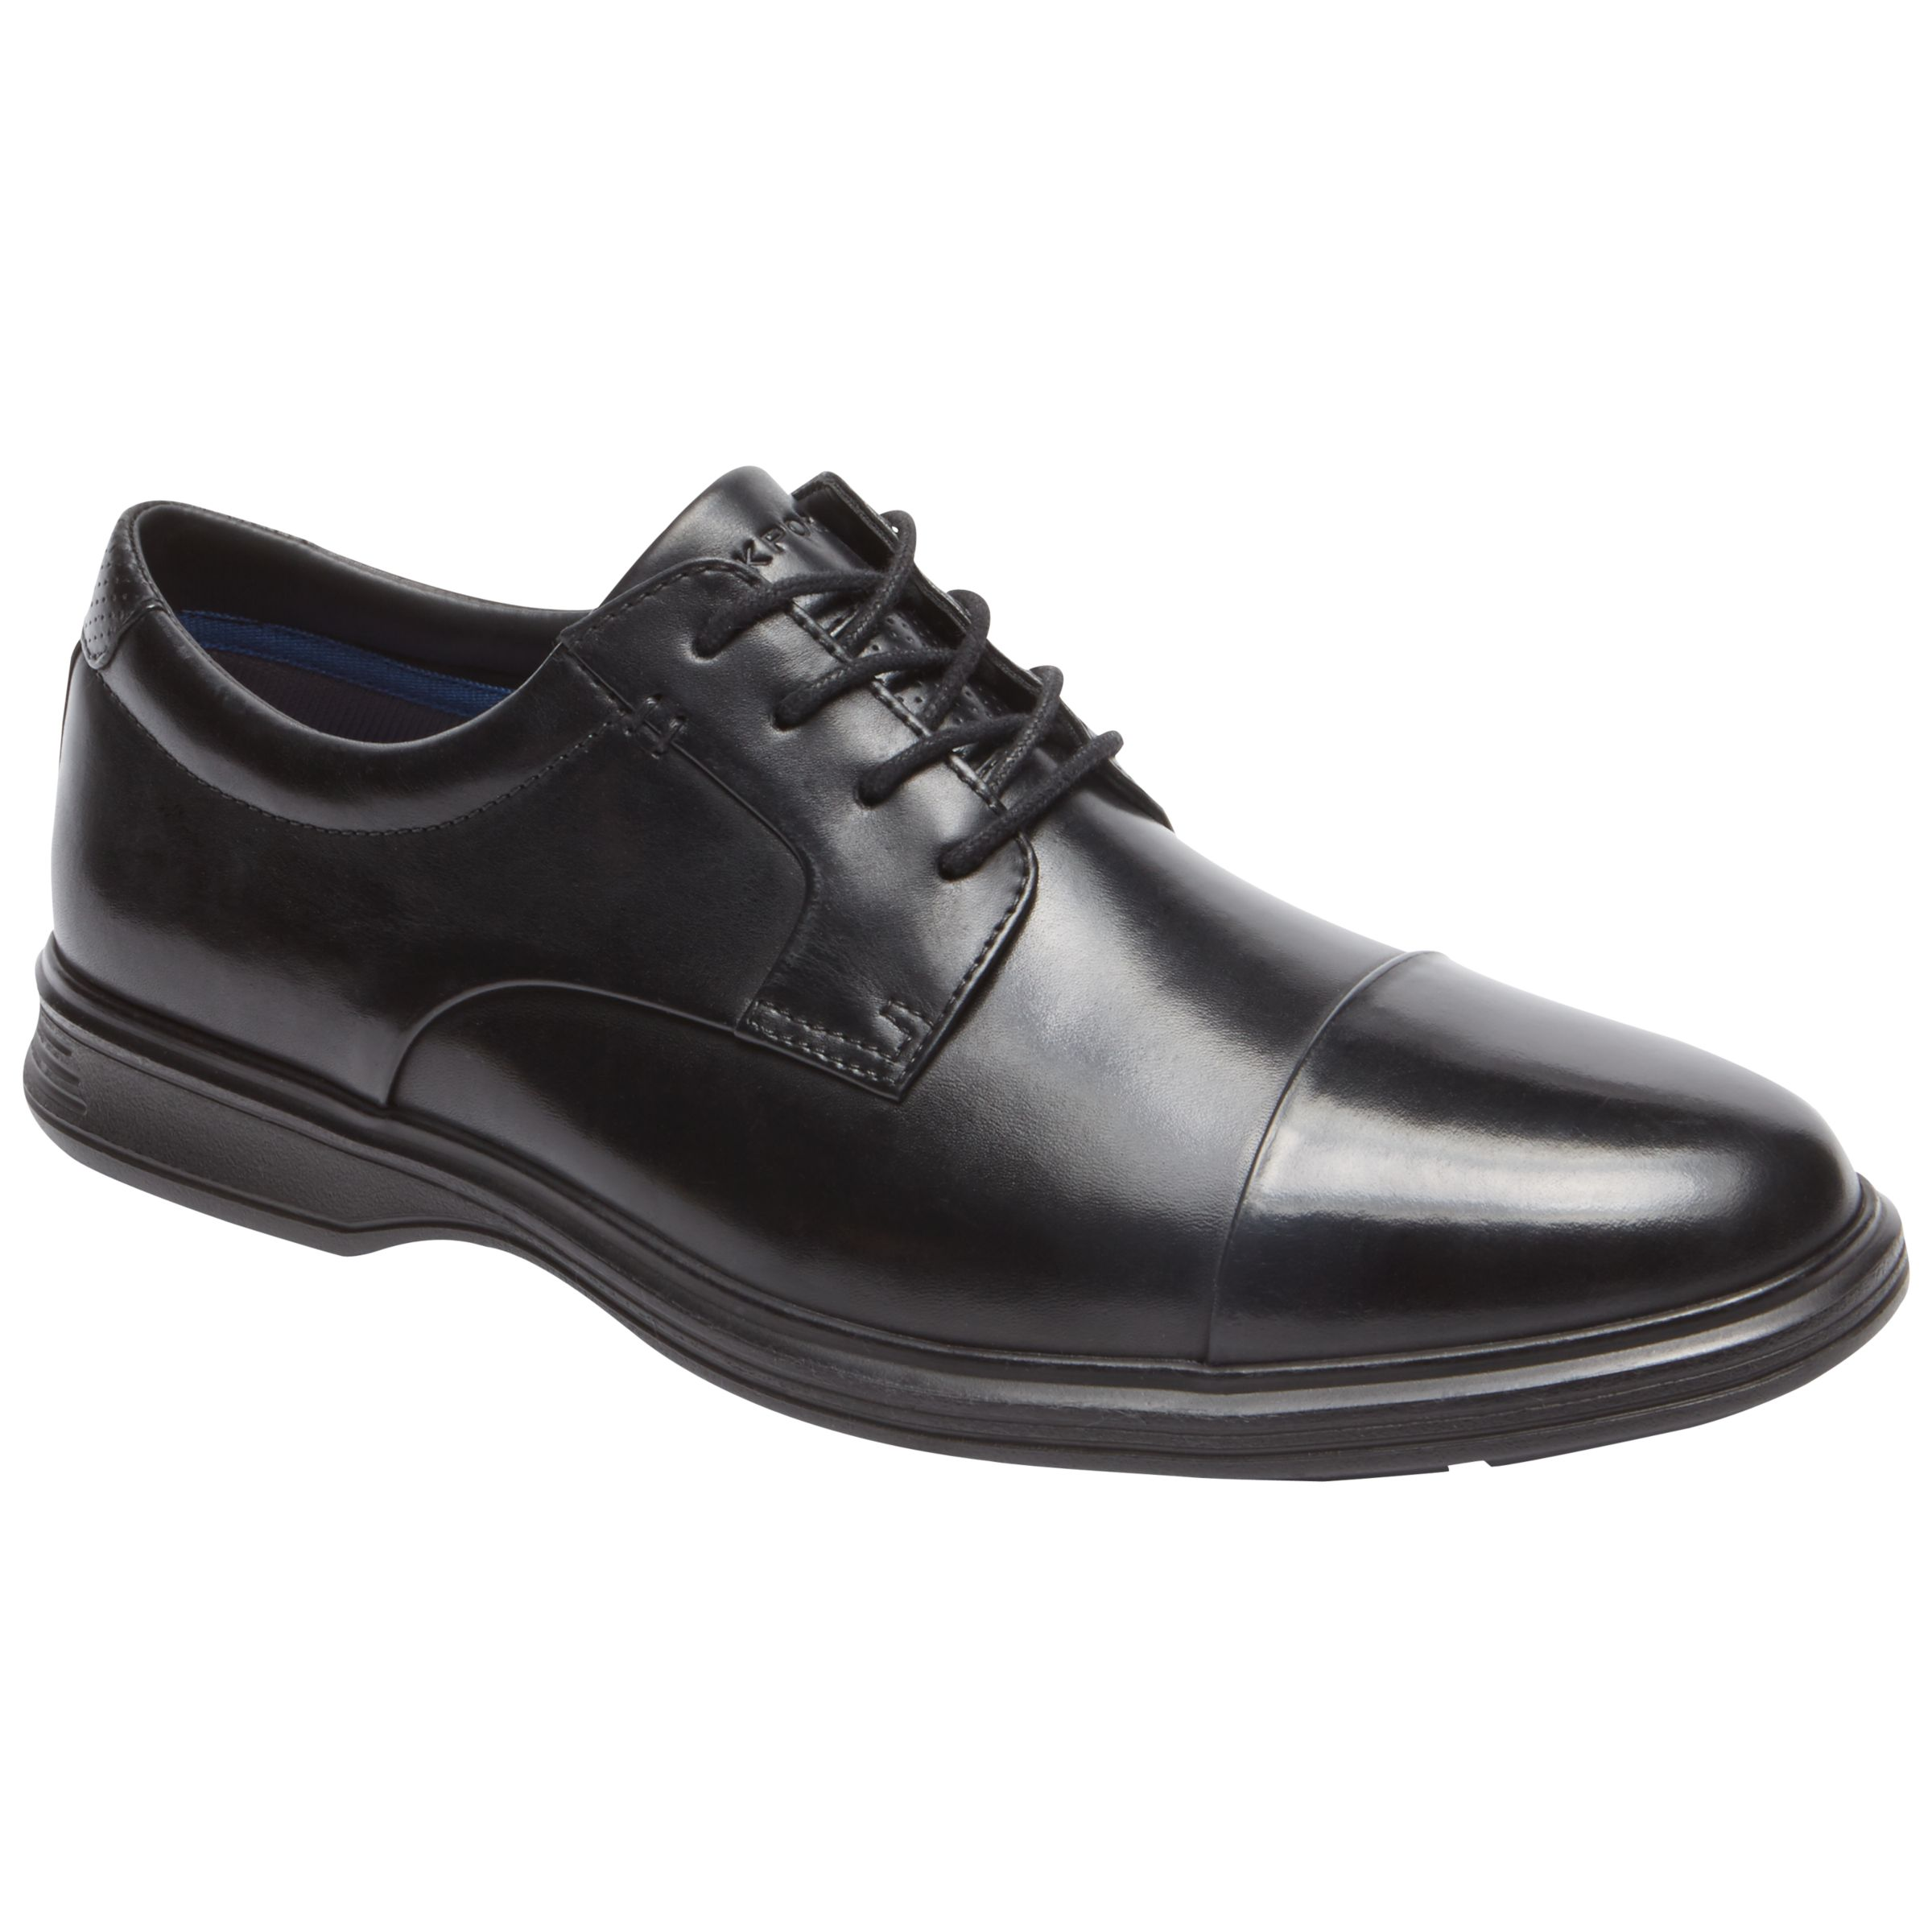 Rockport Rockport Dressports 2 Toe Cap Shoes, Black